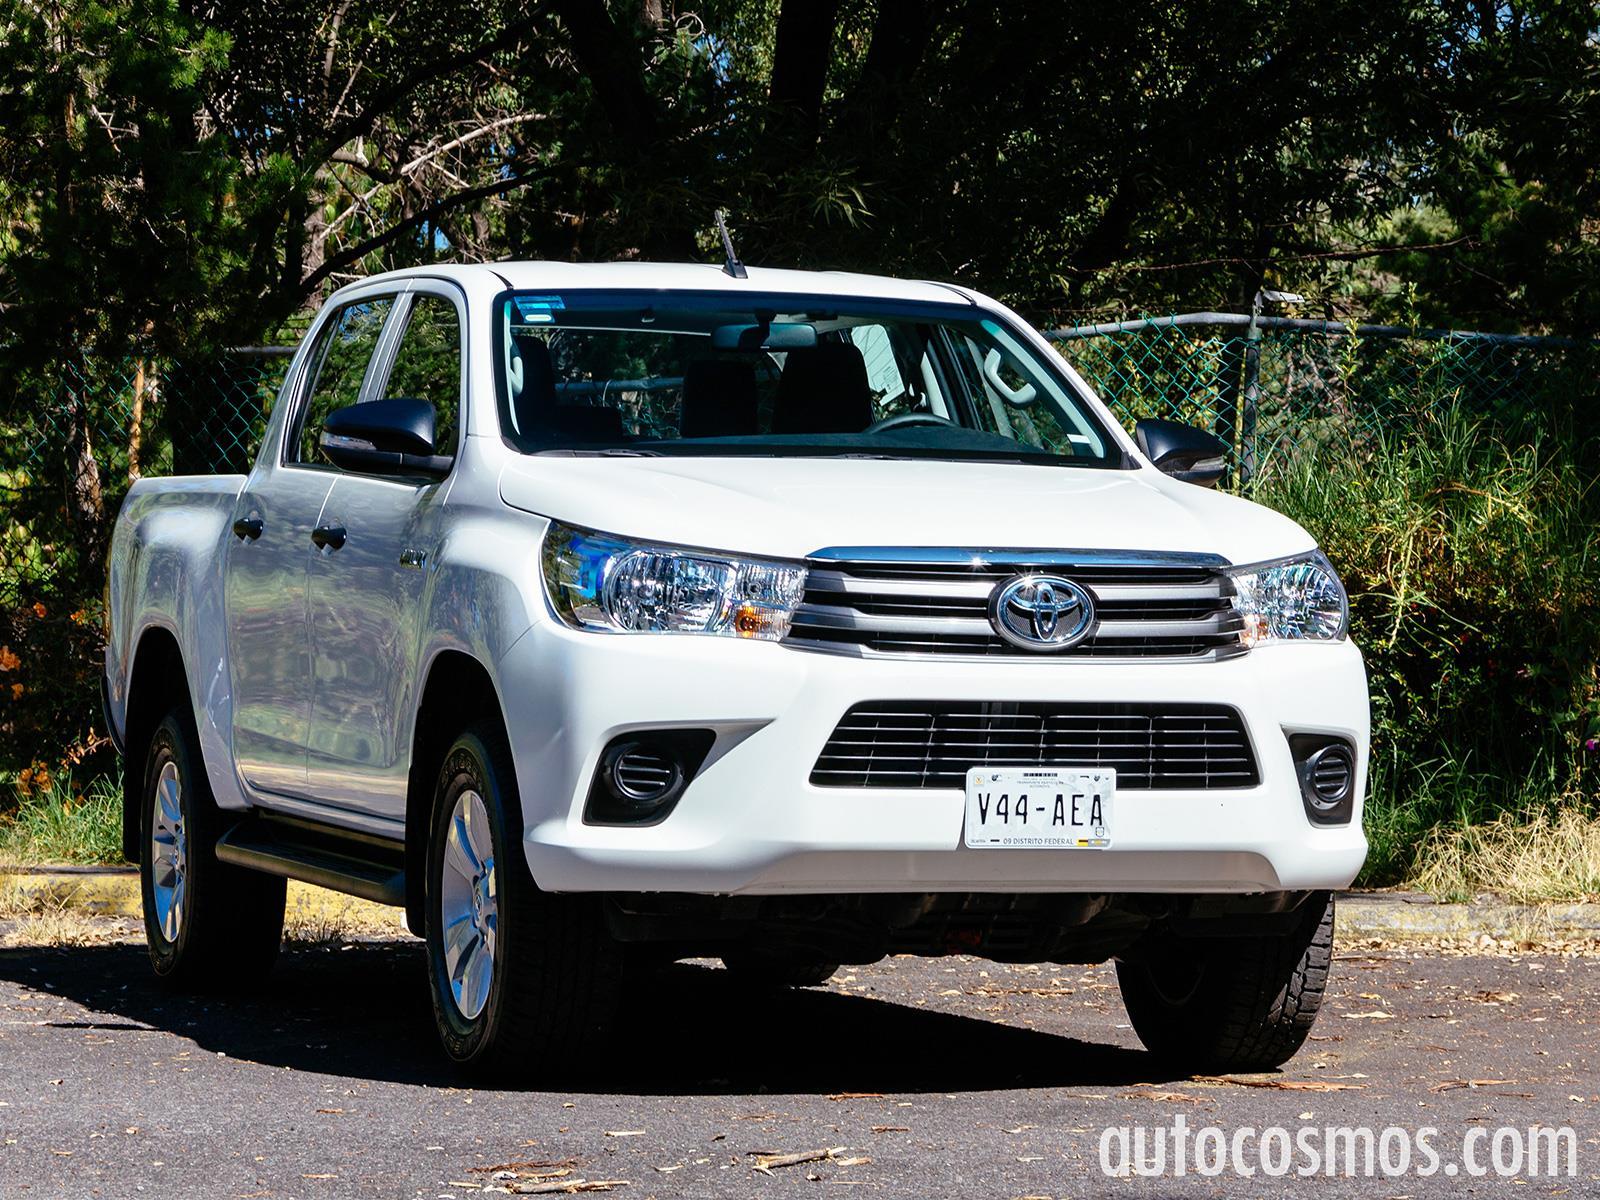 Toyota Hilux 2016 llega a México desde $251,900 pesos - Autocosmos